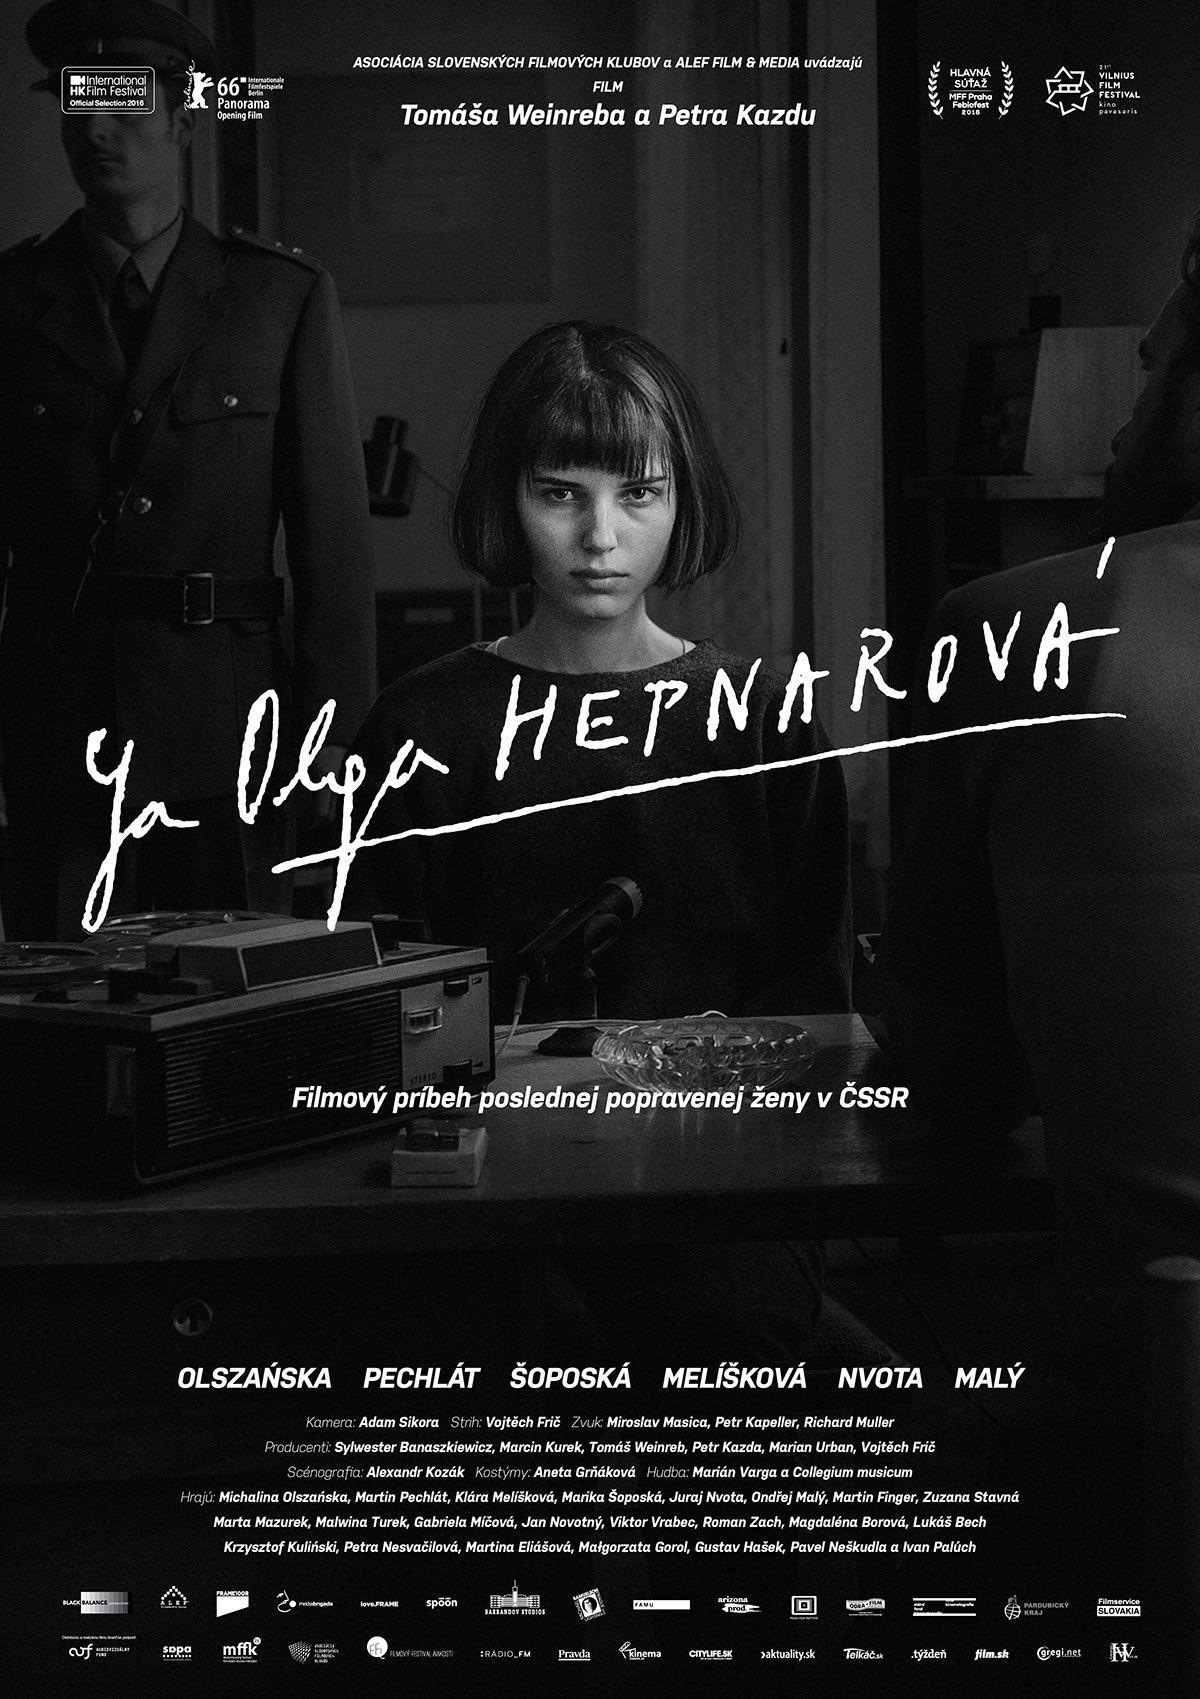 Já, Olga Hepnarová (Tomáš Weinreb & Petr Kazda, 2016) Cinéma